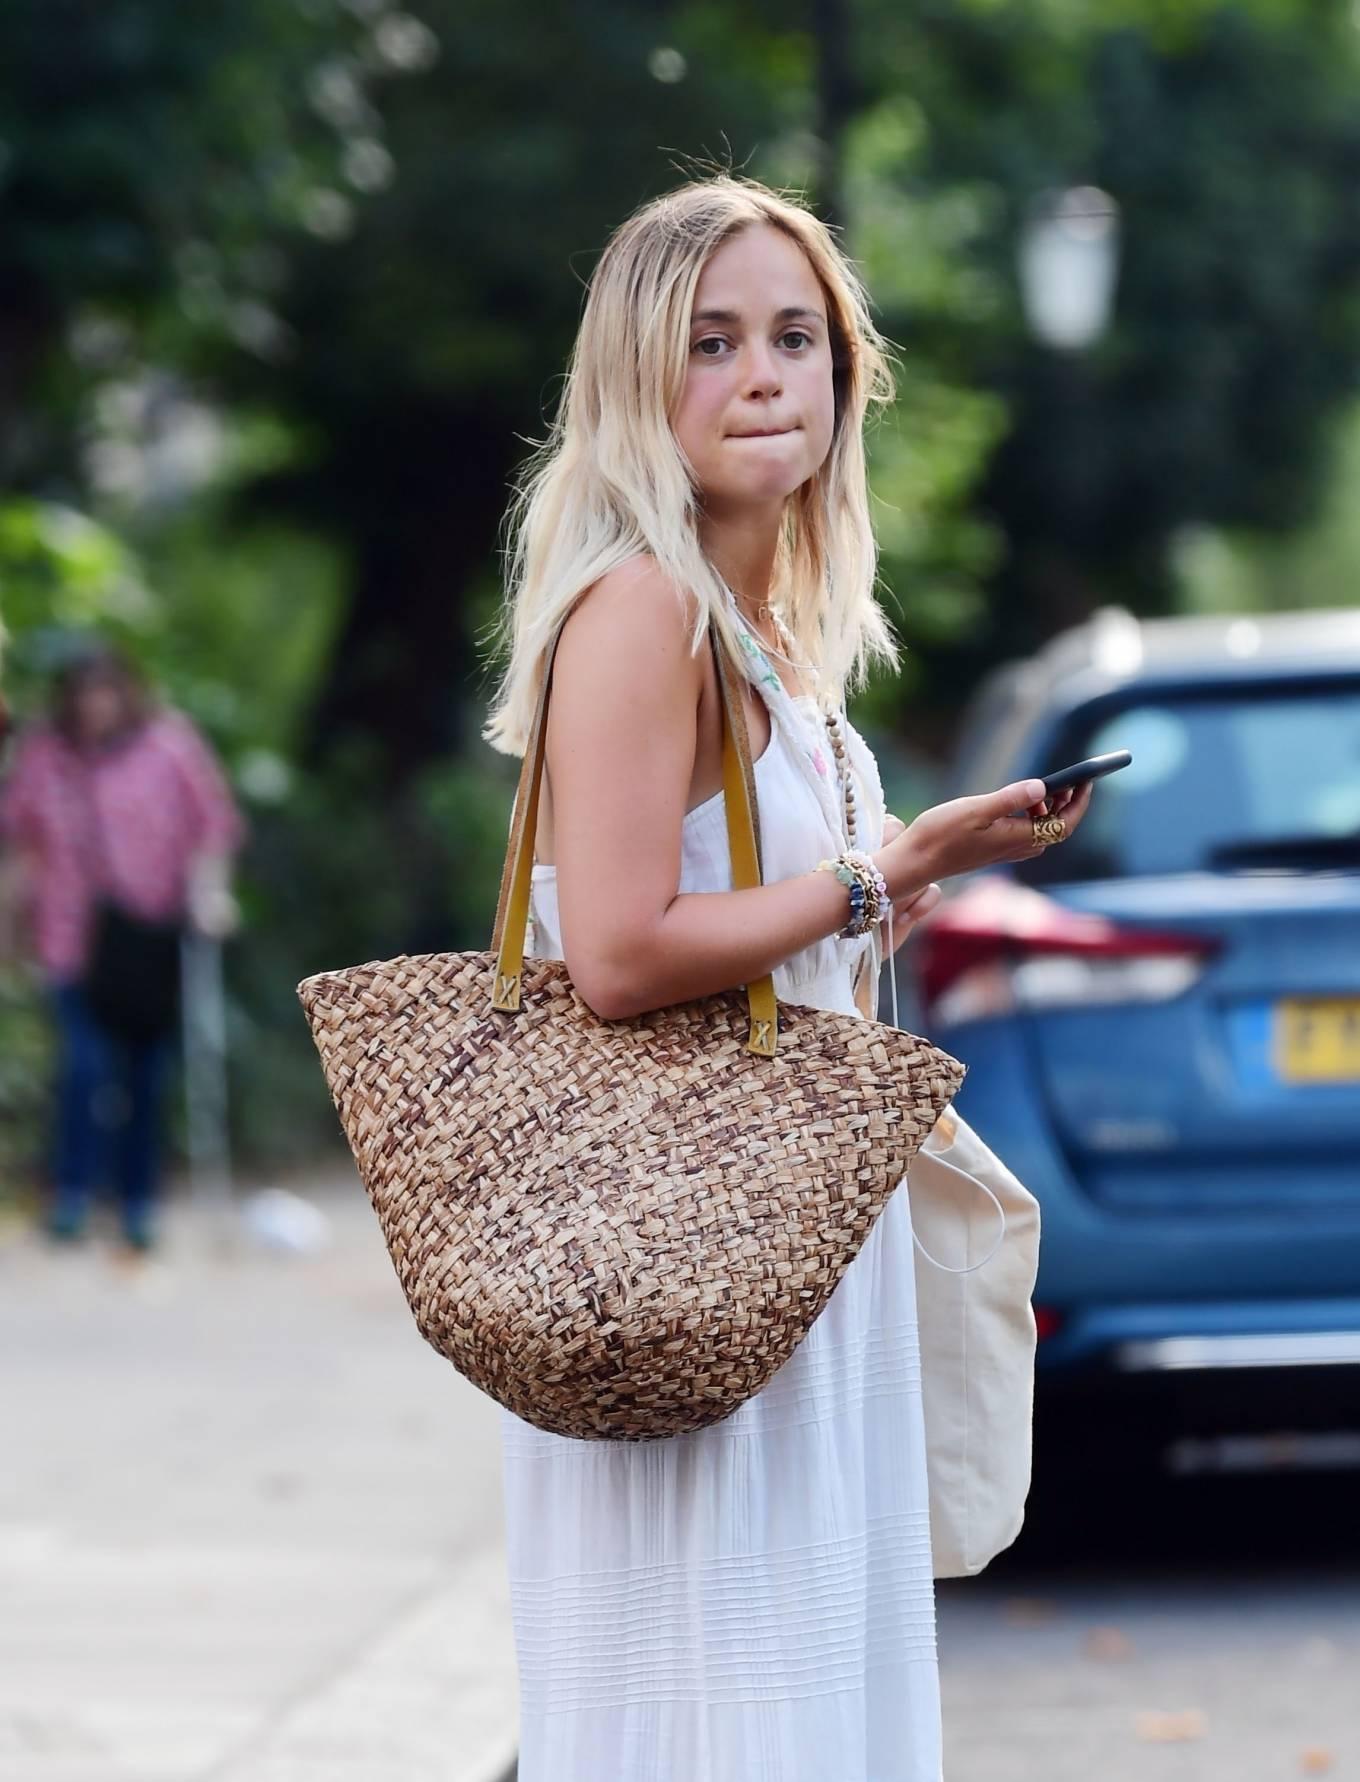 Amelia Windsor 2020 : Amelia Windsor – Looks stunning in a white summery dress in London-20